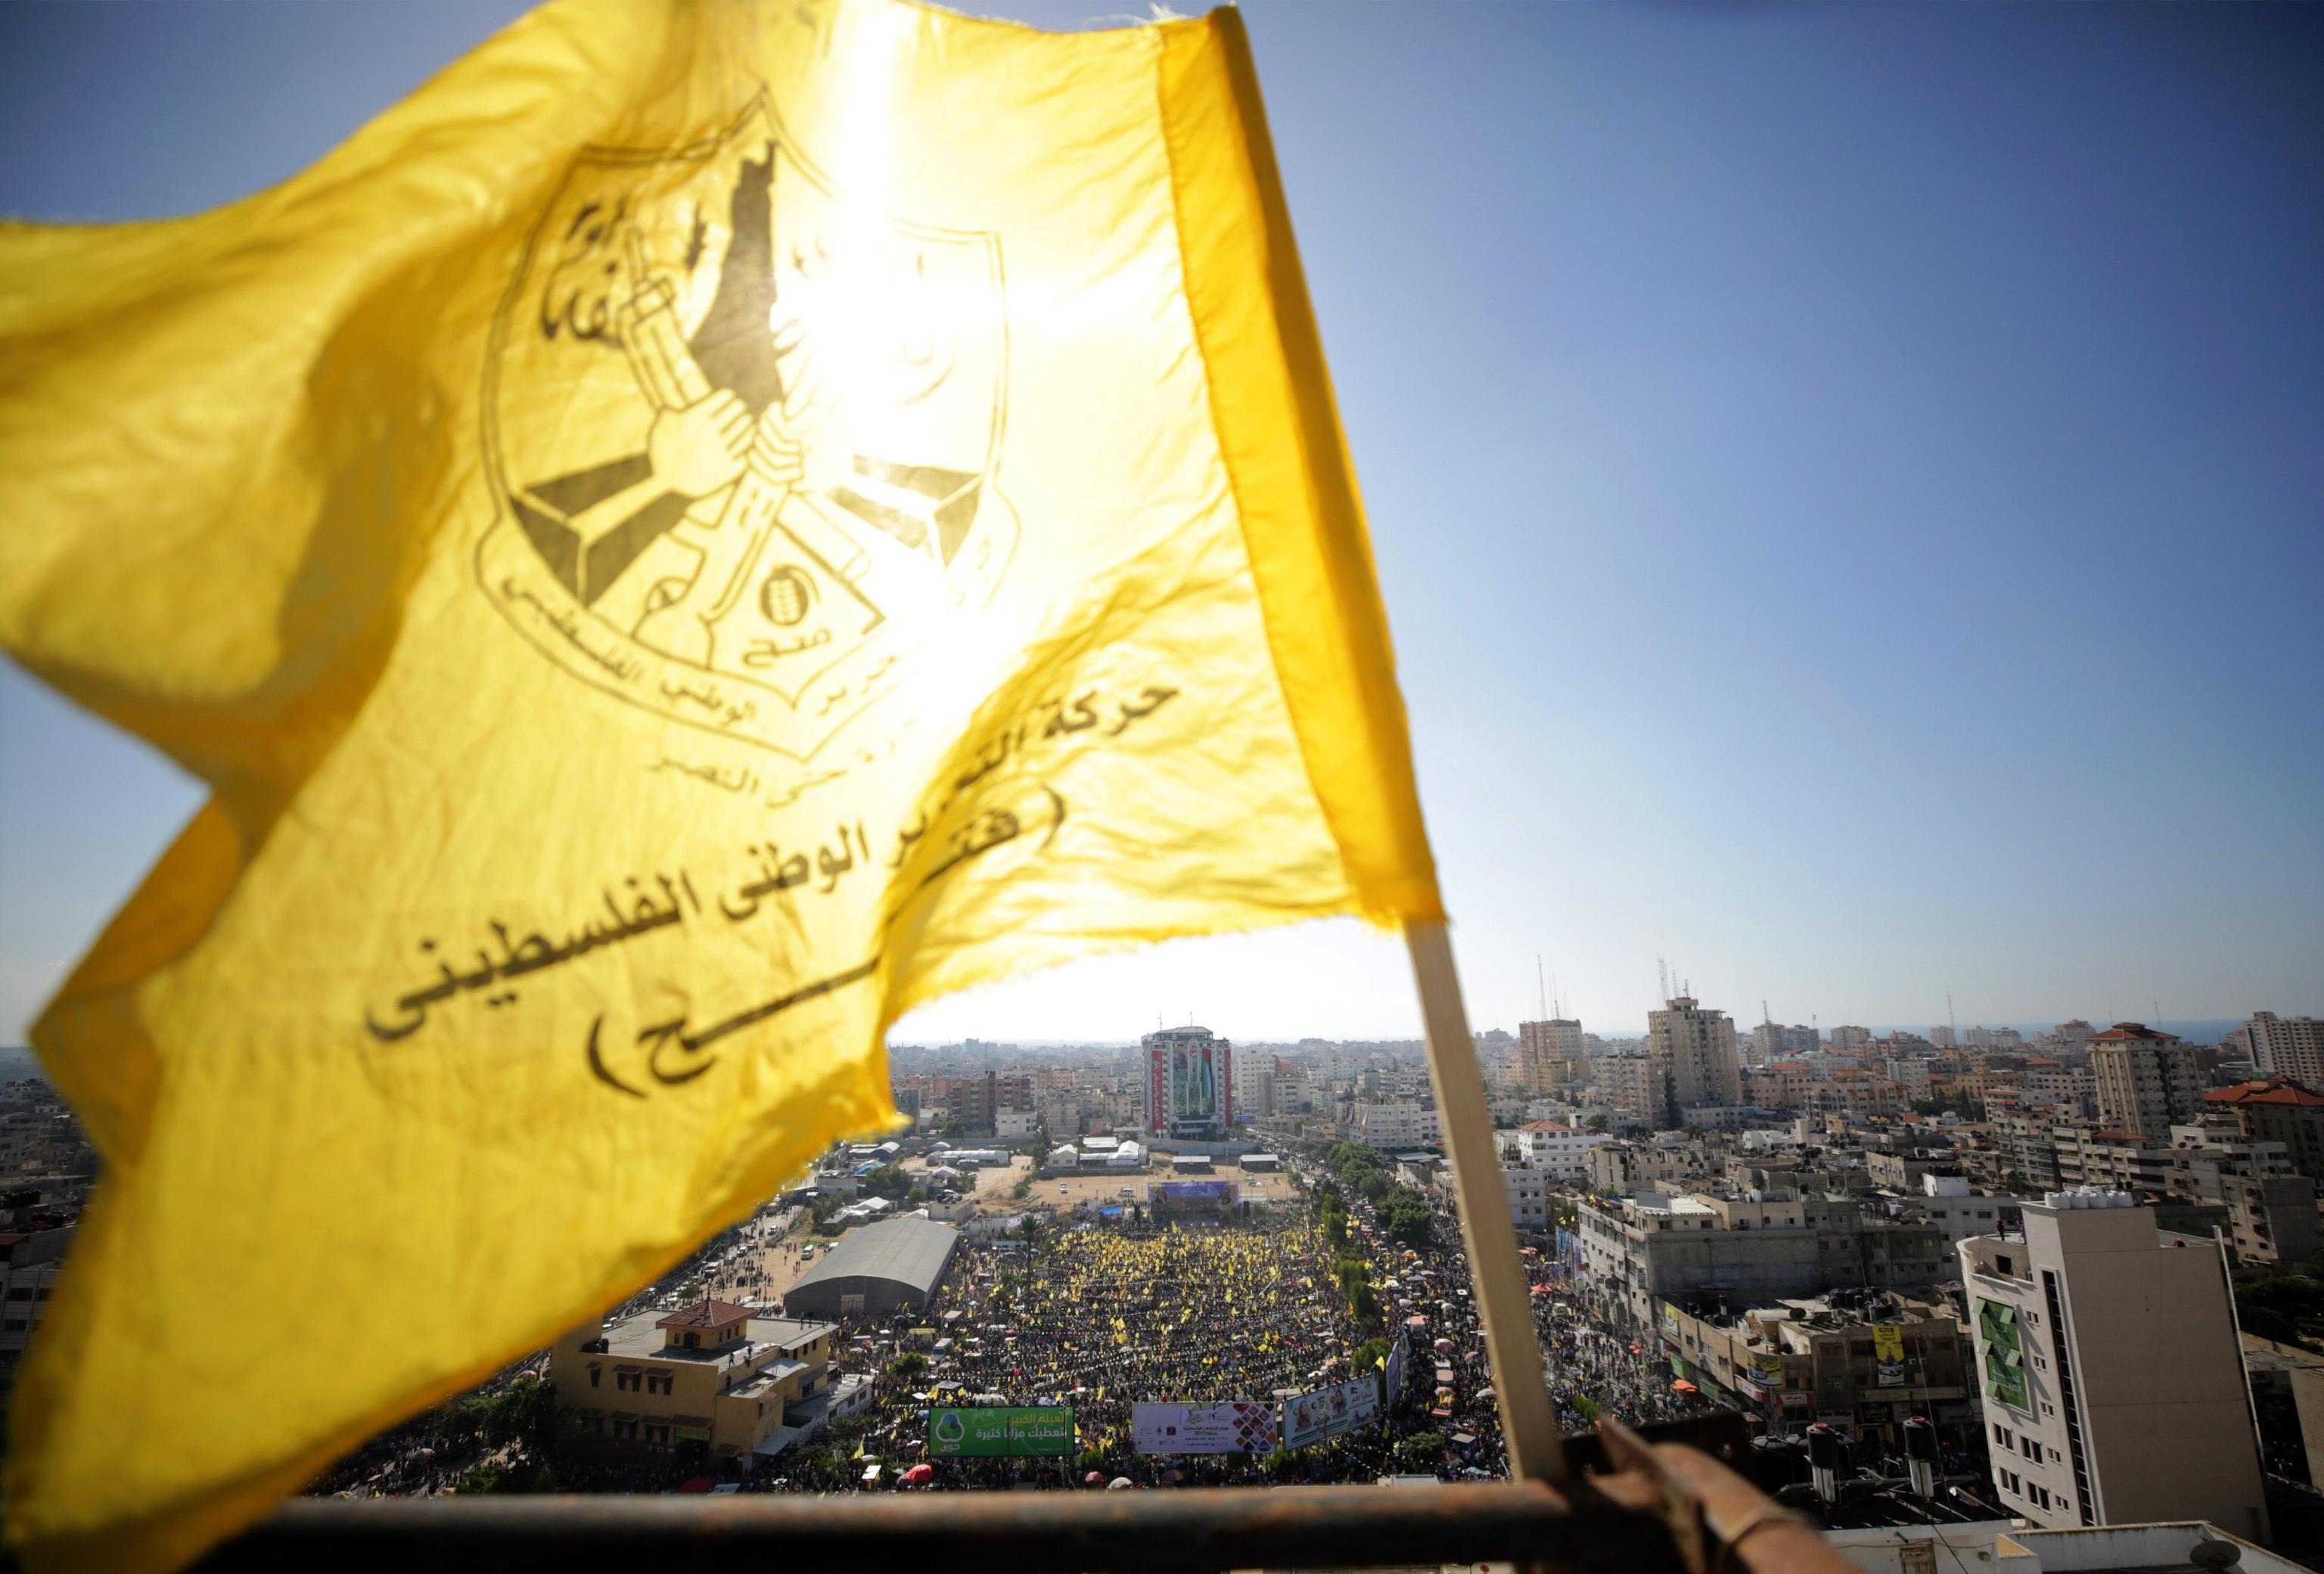 Gaza ricorda anniversario morte Arafat